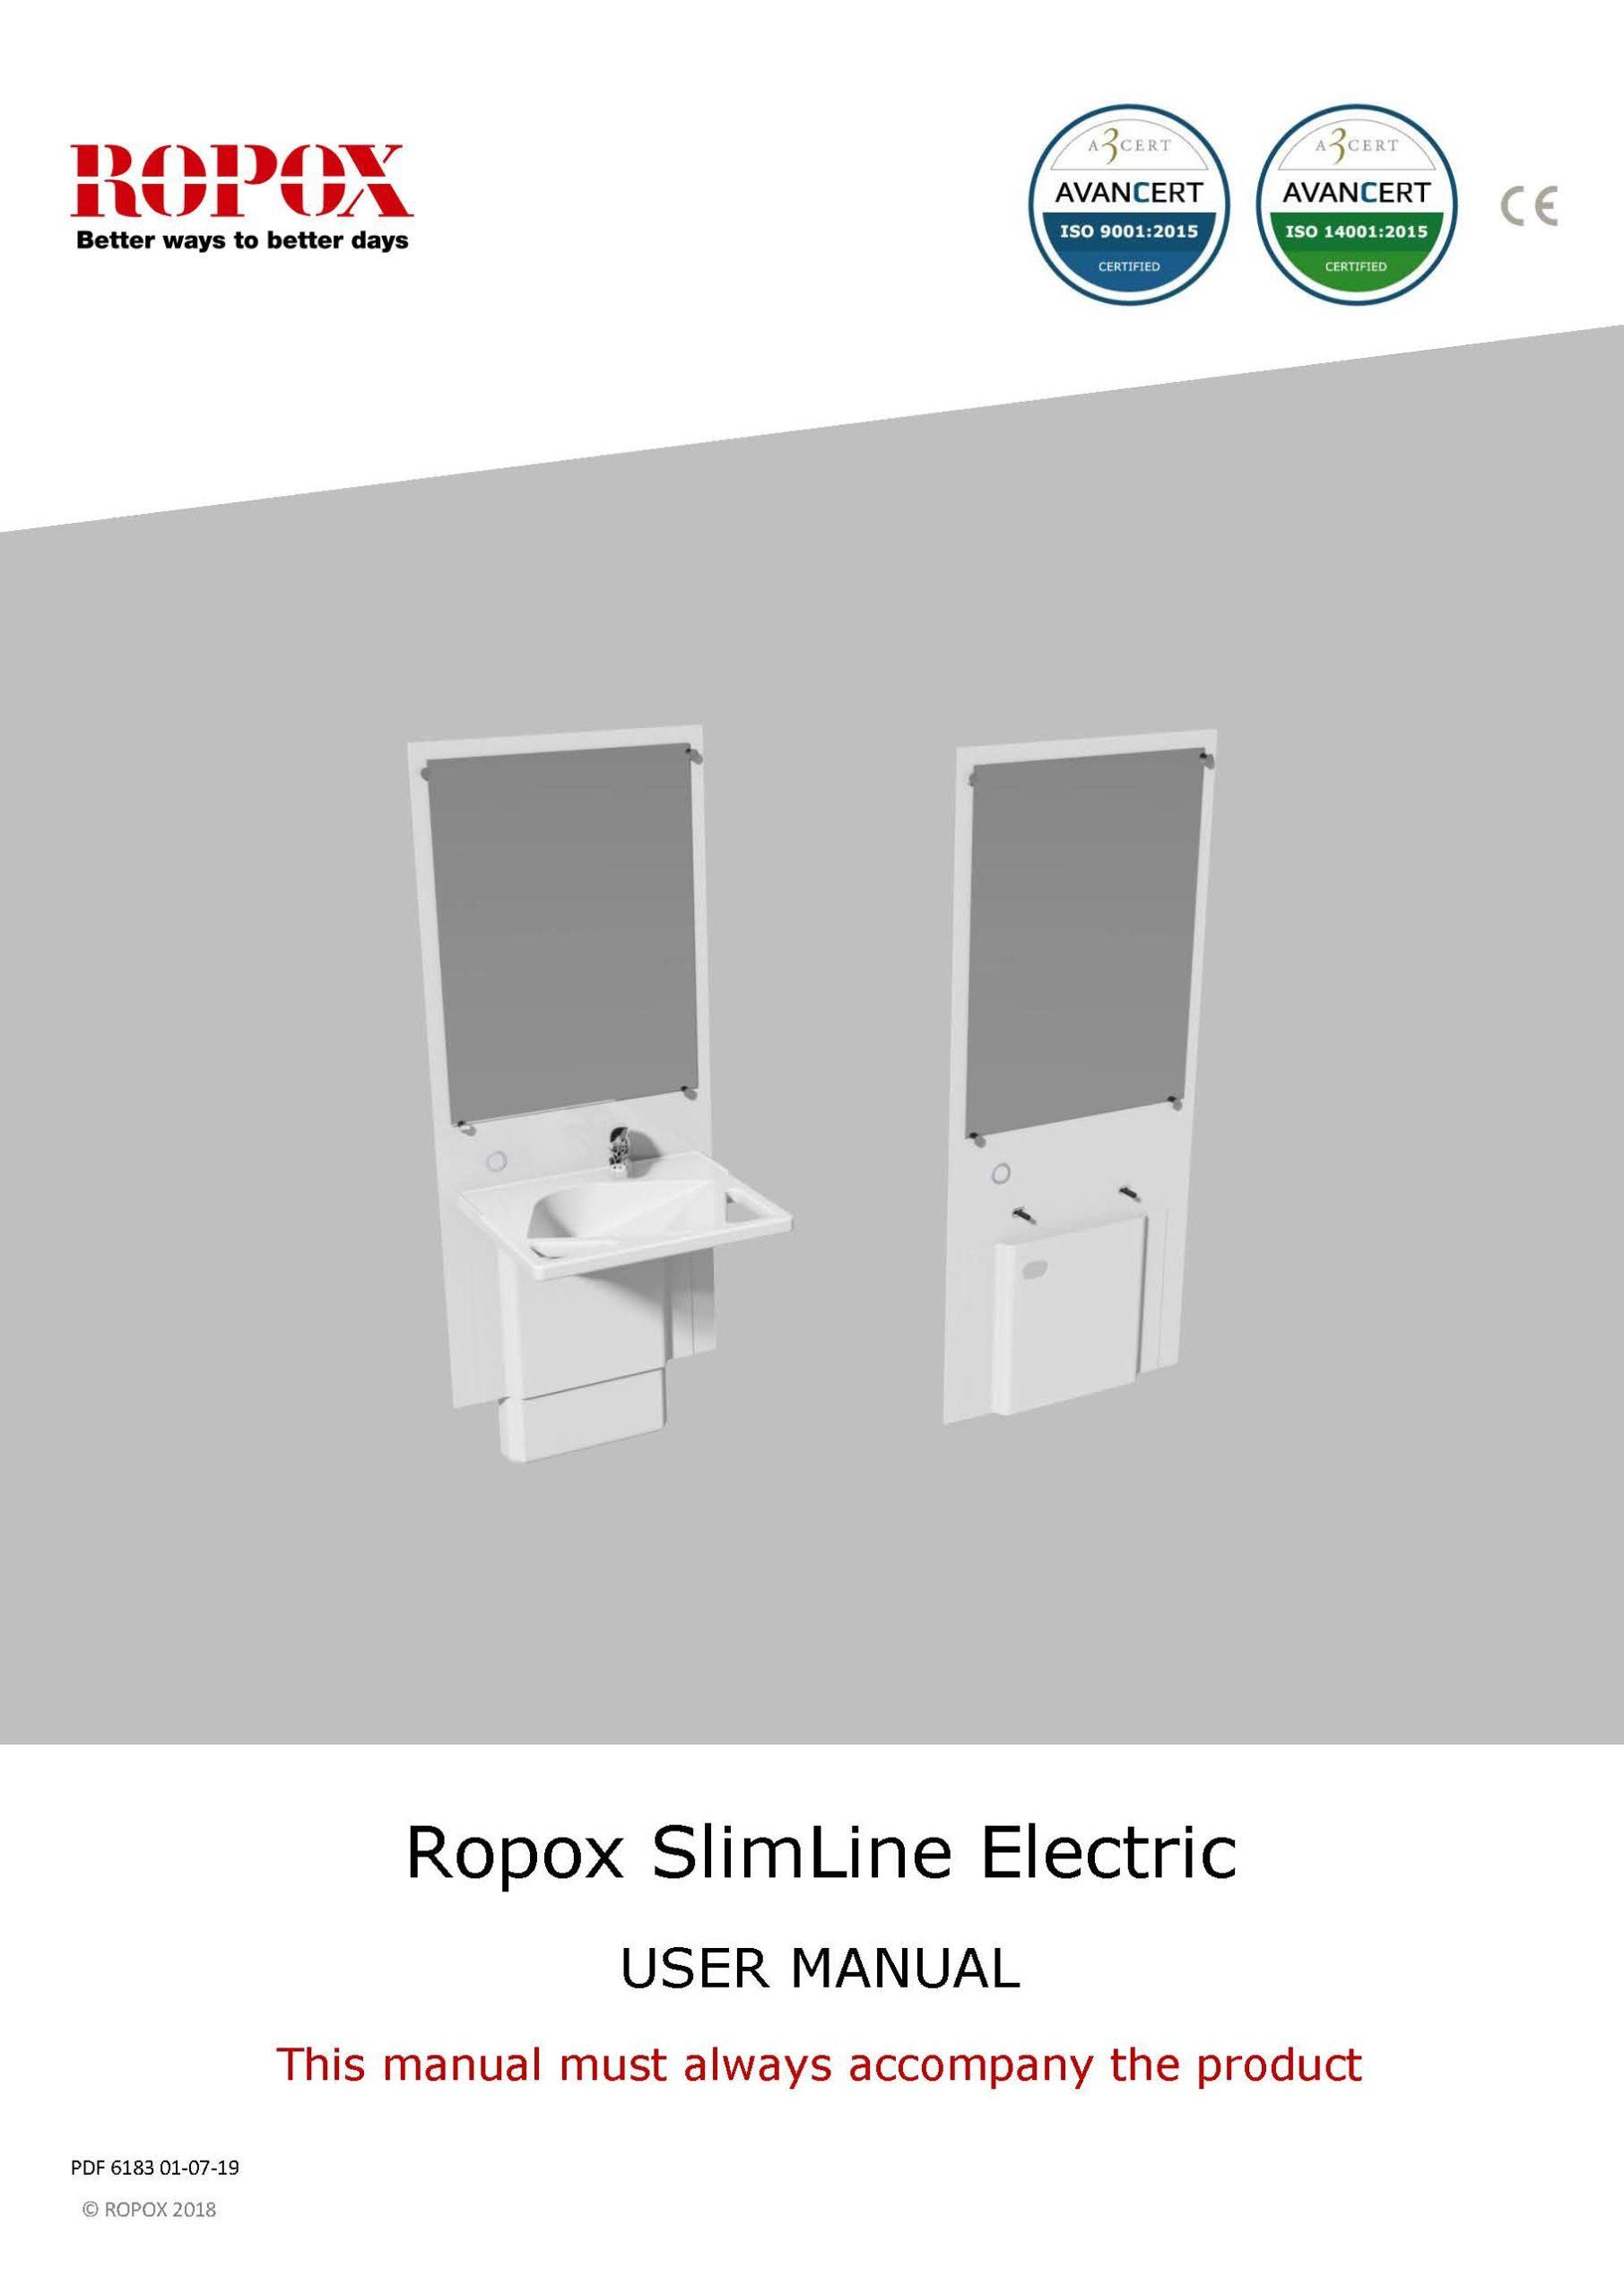 Ropox User Manual - SlimLine Washbasin Electric